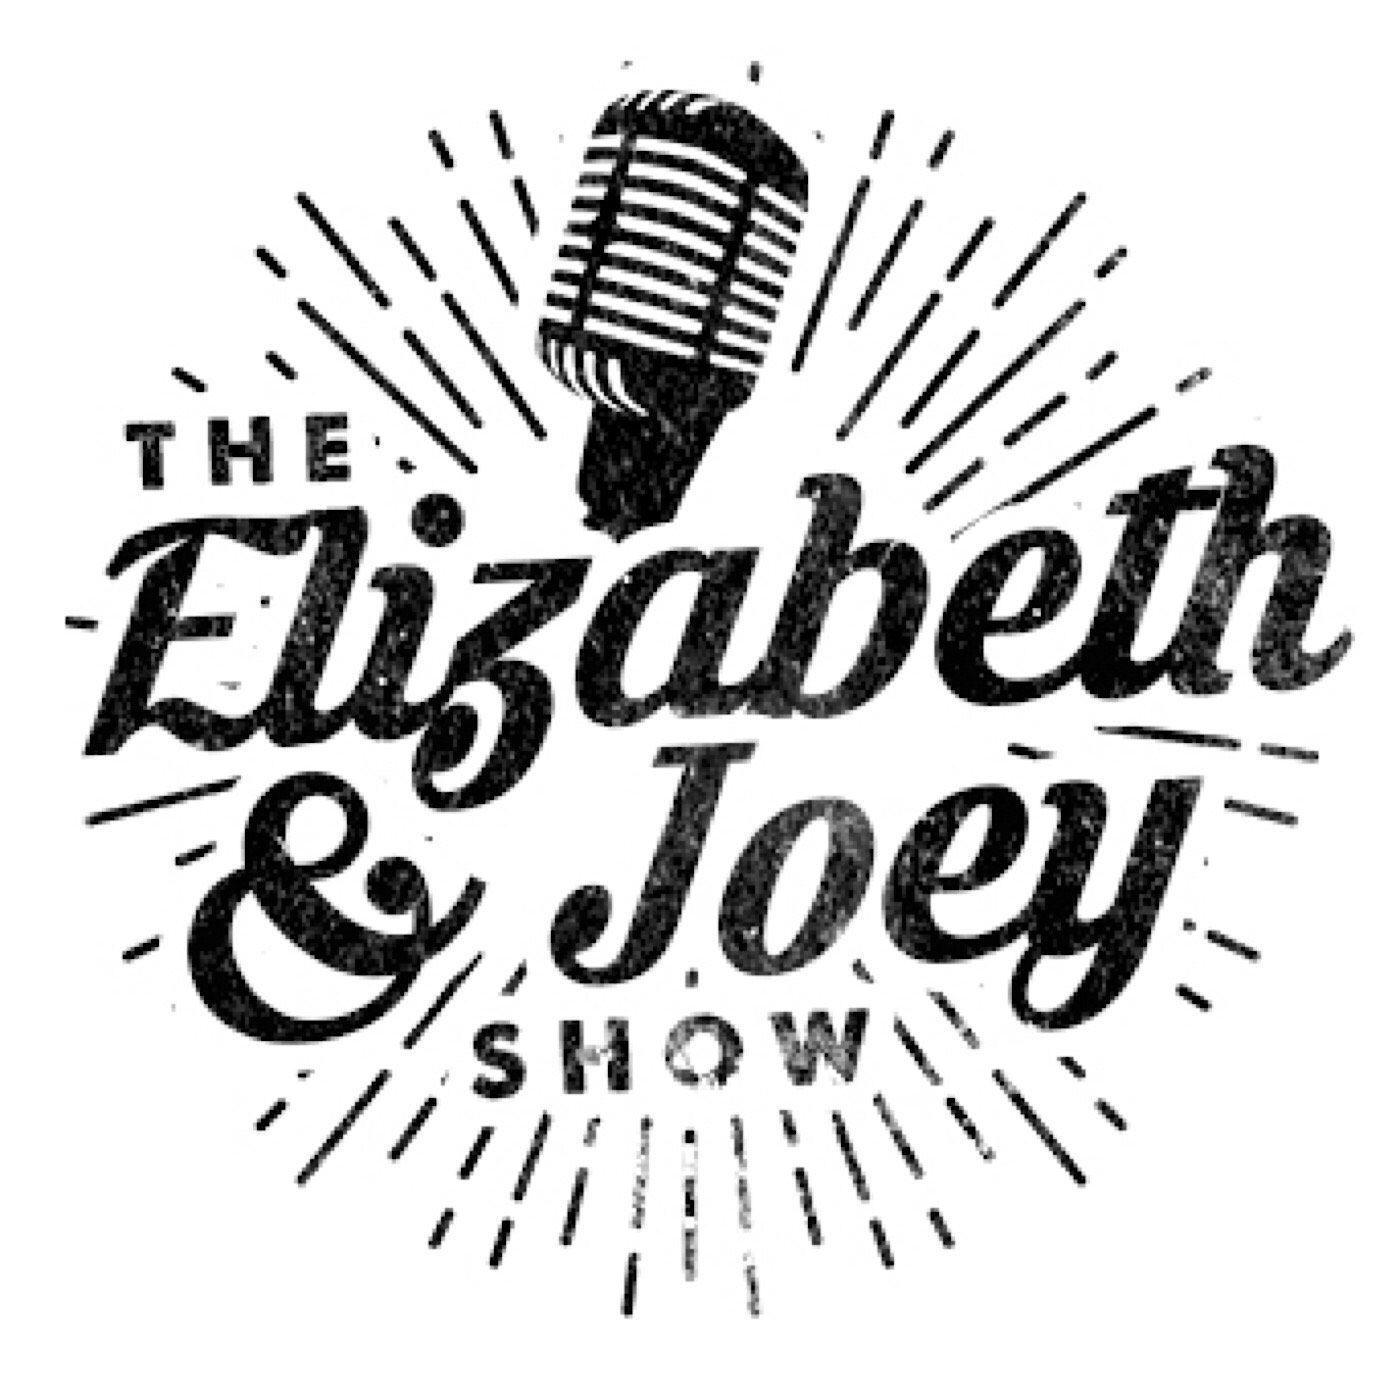 The Elizabeth & Joey Show